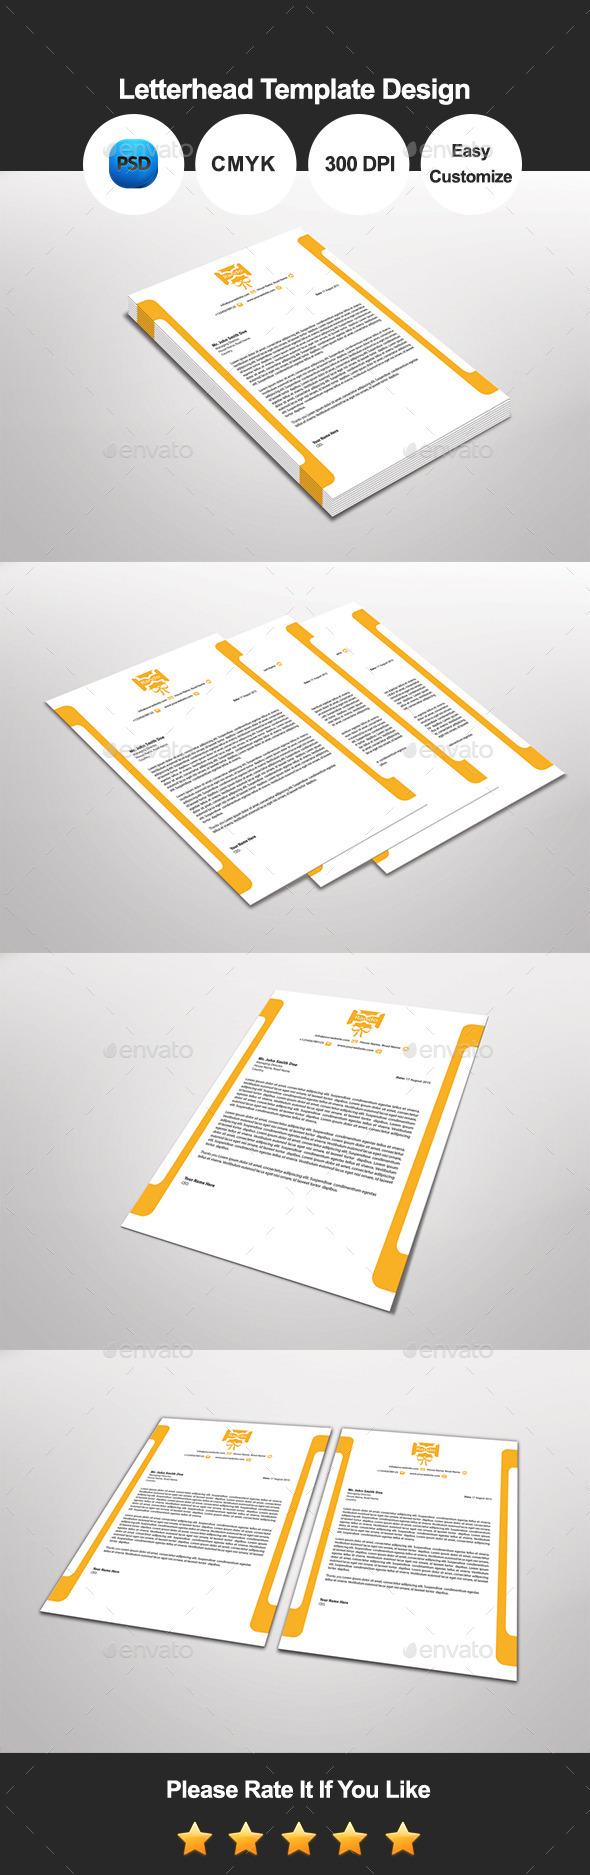 Rando Letterhead Template Design - Proposals & Invoices Stationery